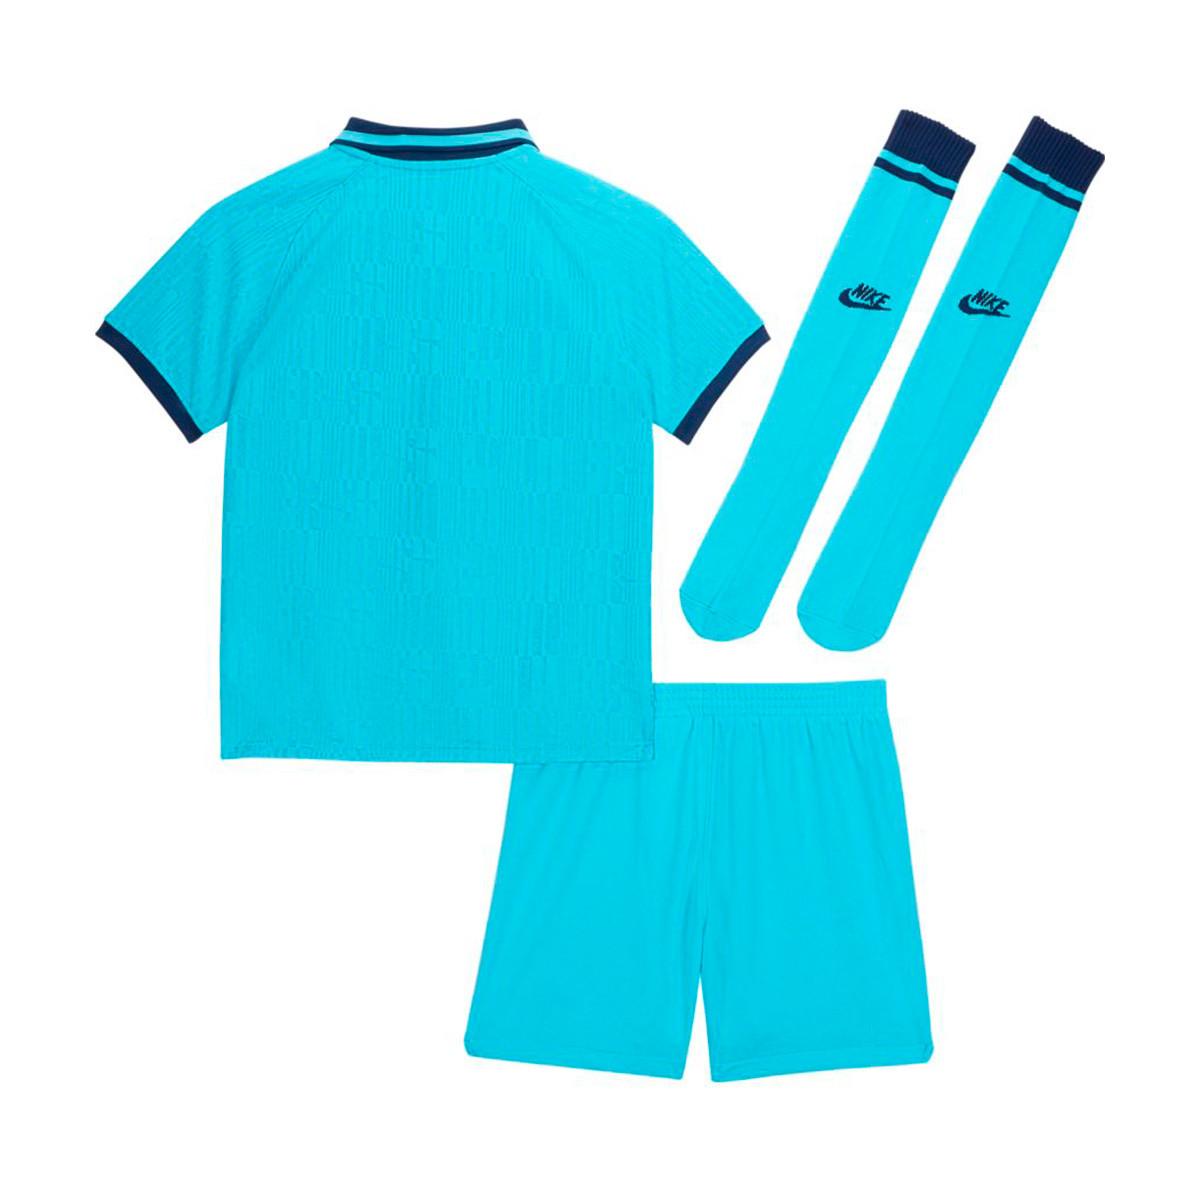 Kit Nike Tottenham Hotspur Breathe Tercera Equipacion 2019 2020 Nino Blue Fury Binary Blue Football Store Futbol Emotion